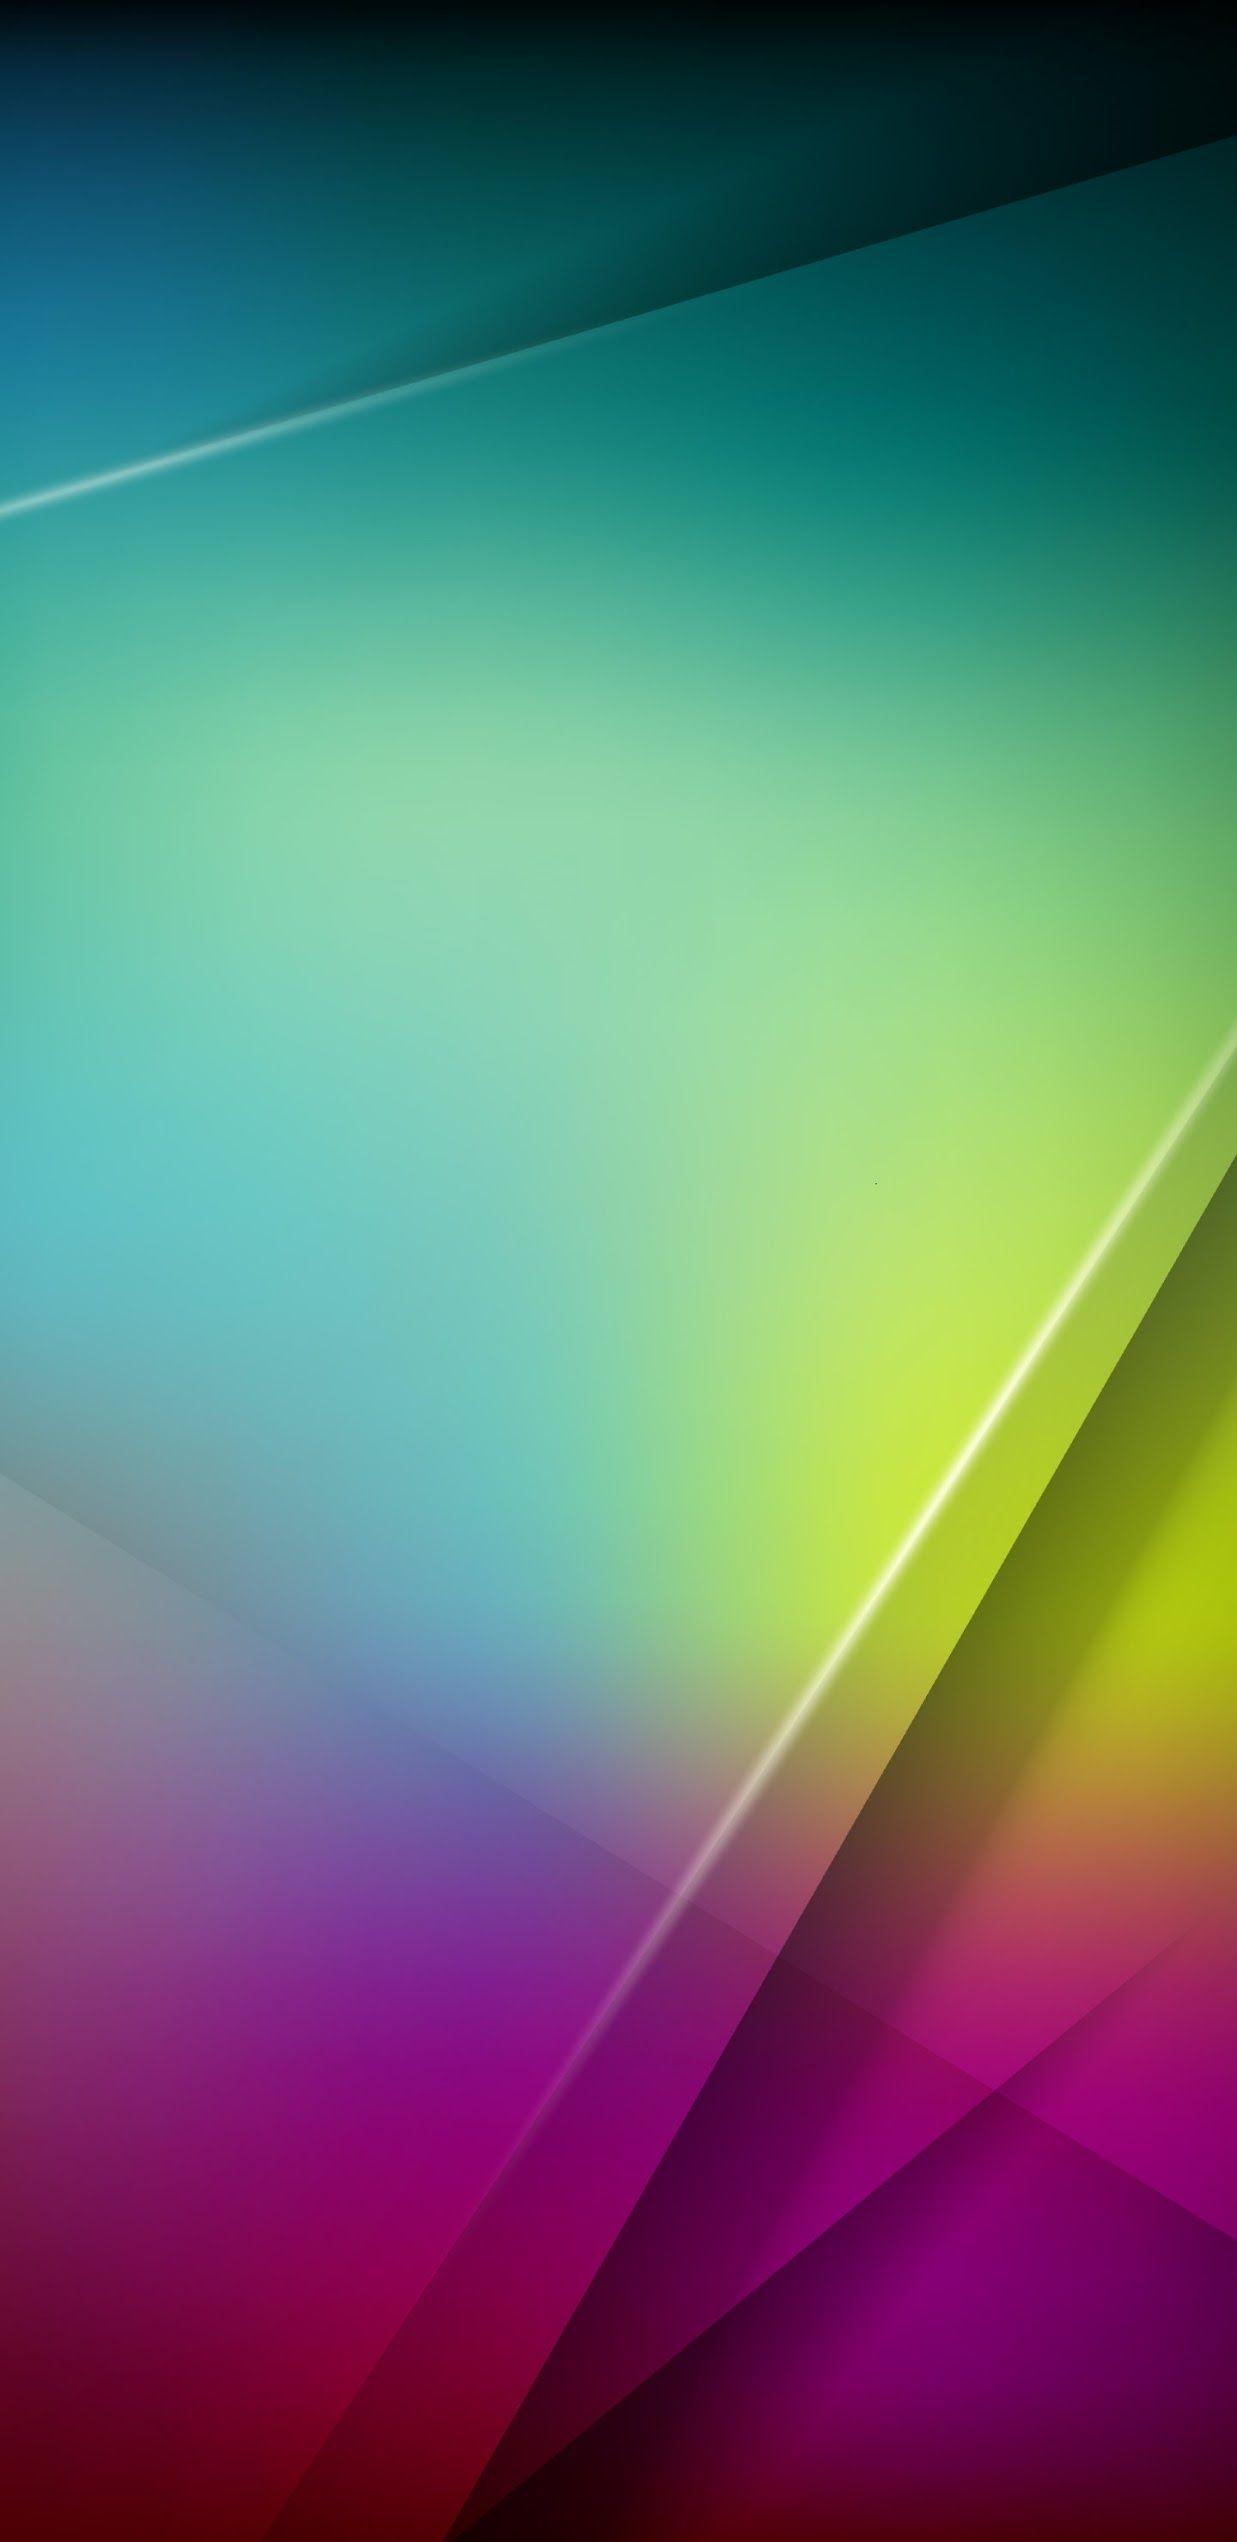 Wallpapers Samsung Galaxy S9 01 Rainbow Cellphone Wallpaper Samsung Galaxy S9 Wallpaper